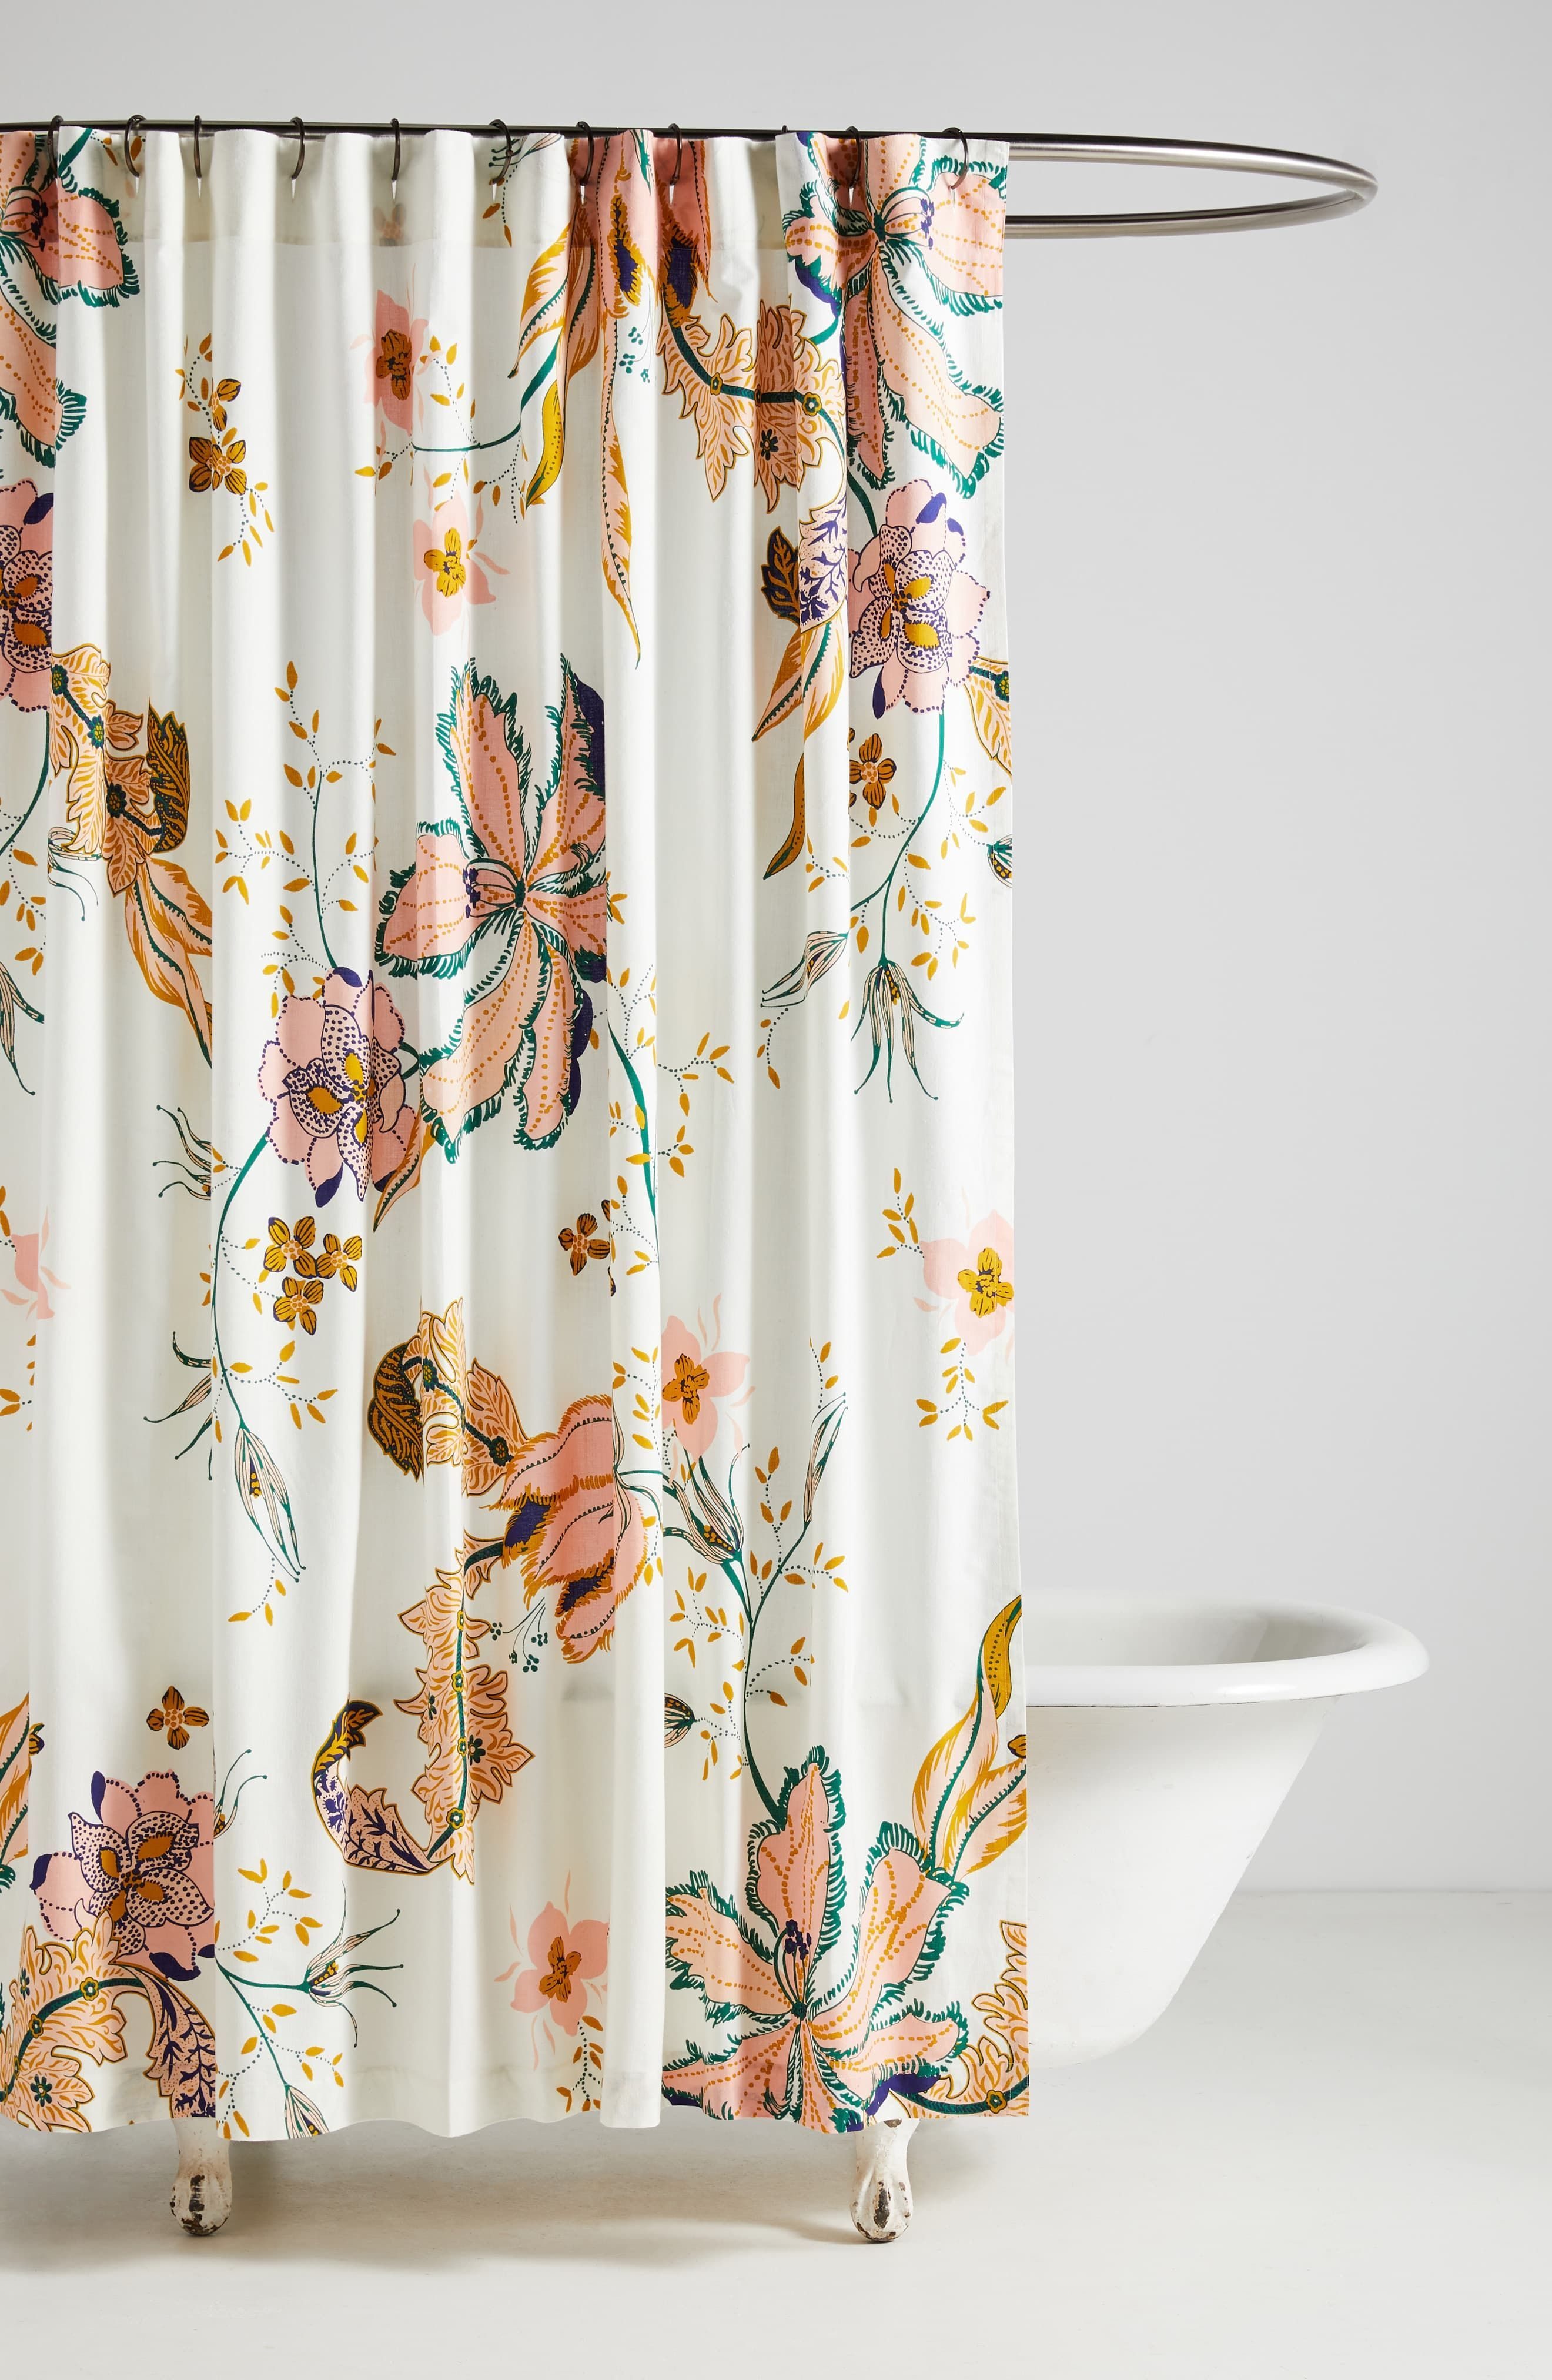 shower curtain #shower #curtain * shower curtain ideas & shower curtain & shower curtain ideas bathroom & shower curtain ideas farmhouse & shower curtain ideas creative & shower curtain rods & shower curtain rod ideas & shower curtain ideas modern